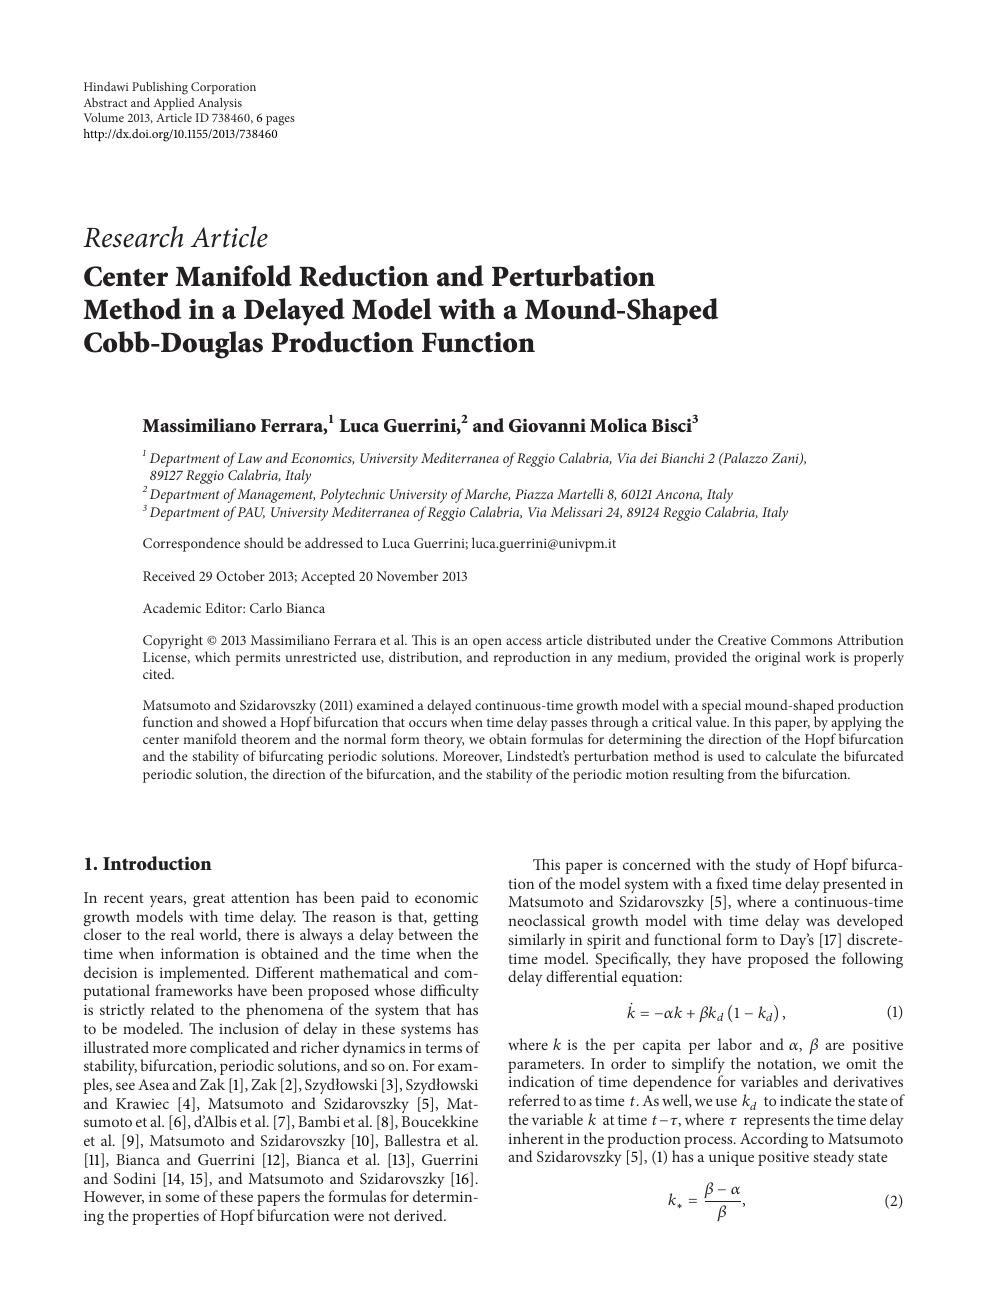 Introduction To Perturbation Methods Pdf